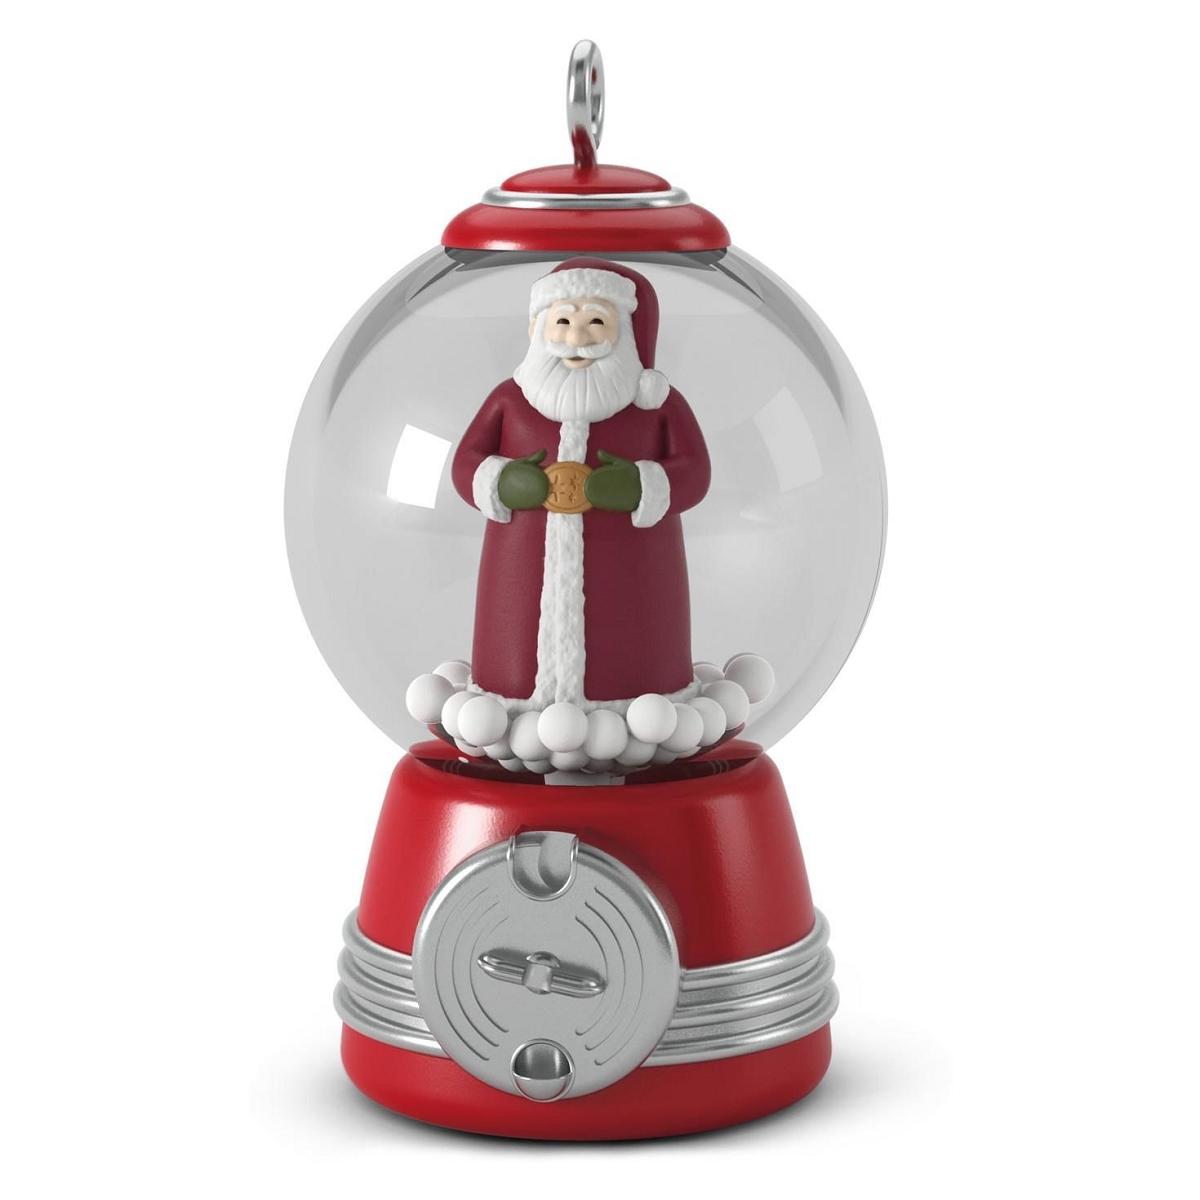 2016 gumball santa hallmark keepsake miniature ornament for Christmas ornaments sale